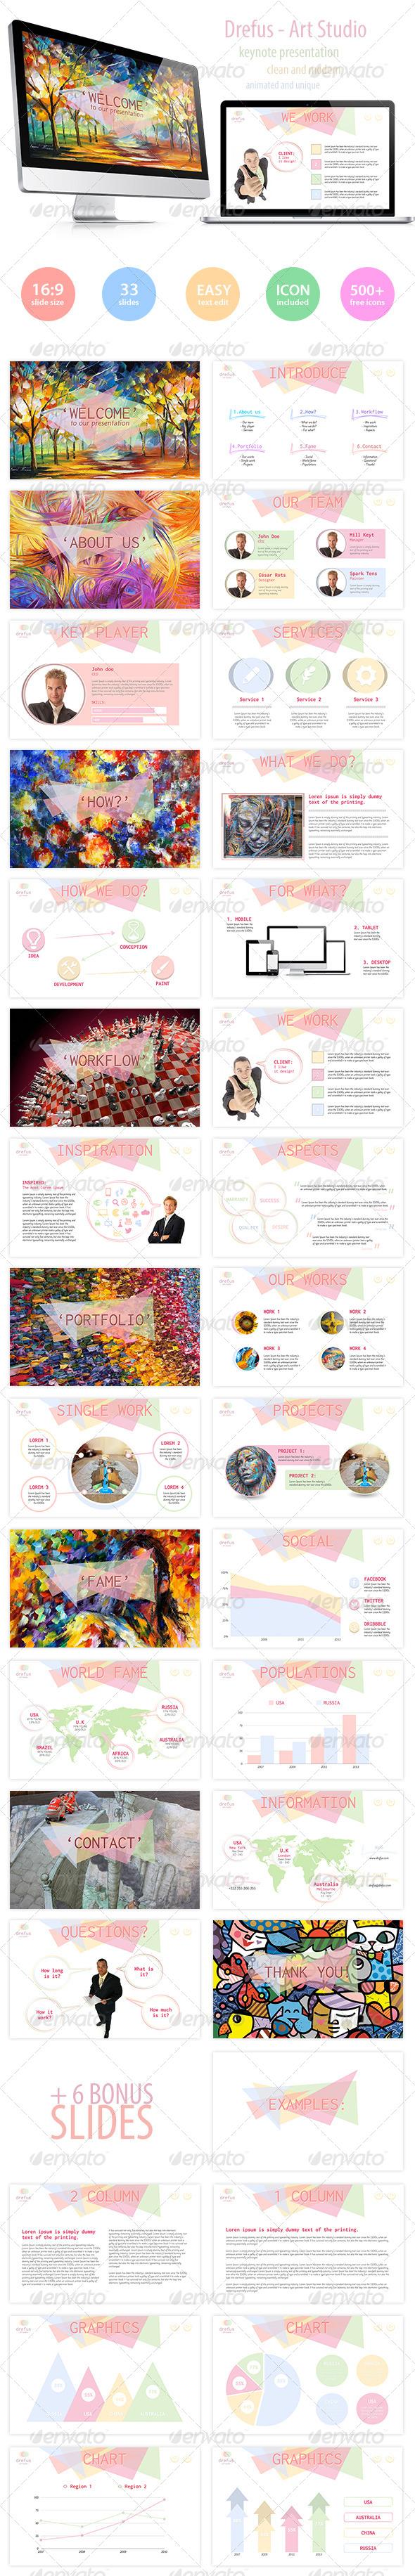 GraphicRiver Drefus Art Keynote Presentation 5848399